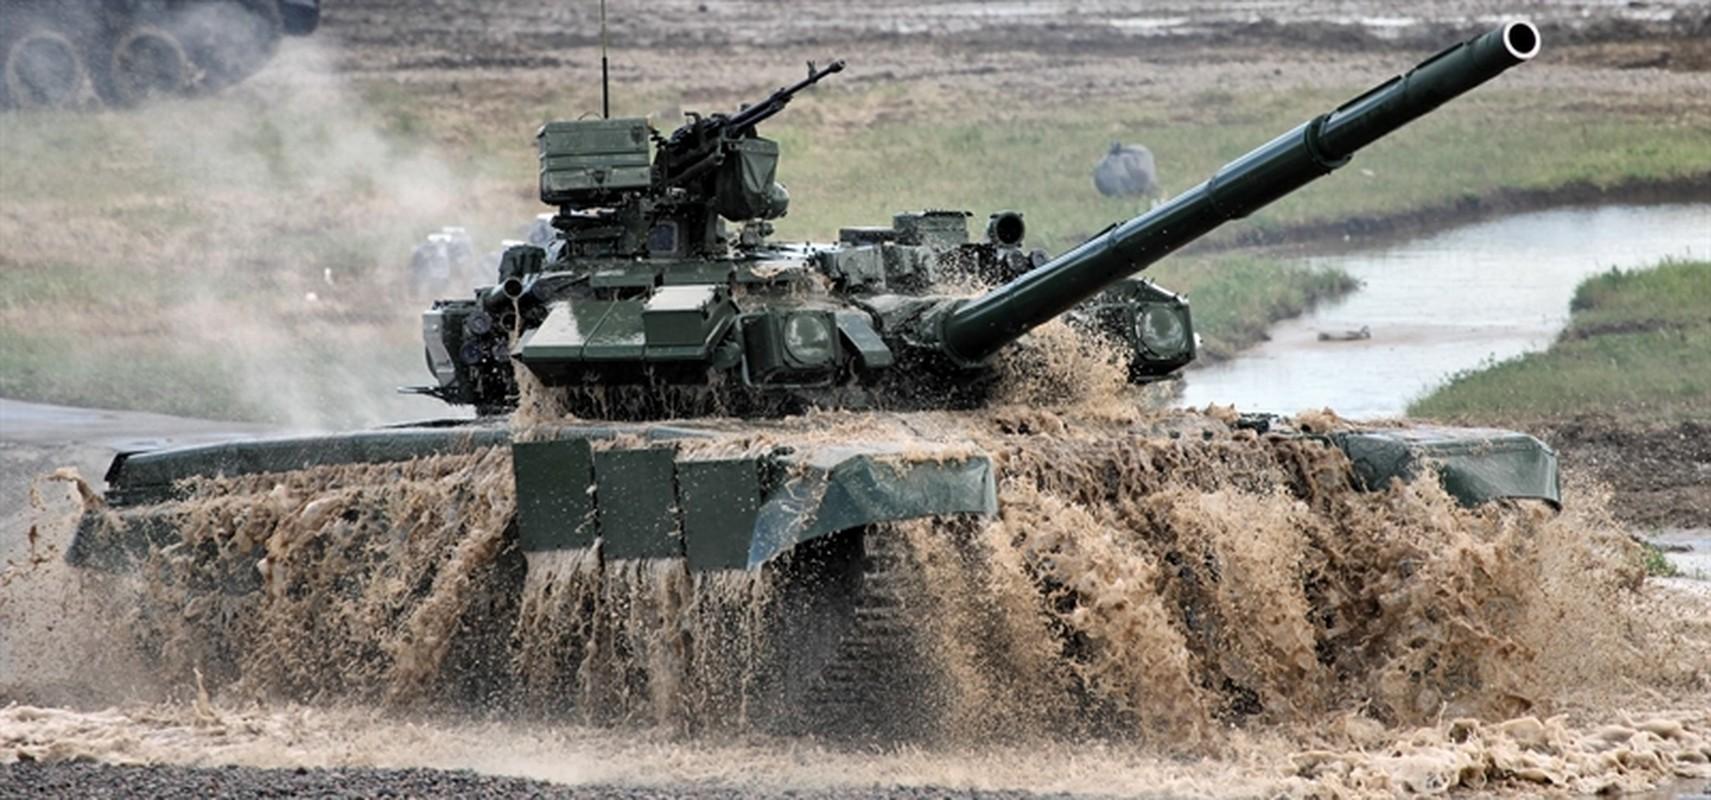 T-14 Armata chua hoan thien, Nga buoc phai bo sung xe tang T-90 nang cap?-Hinh-7